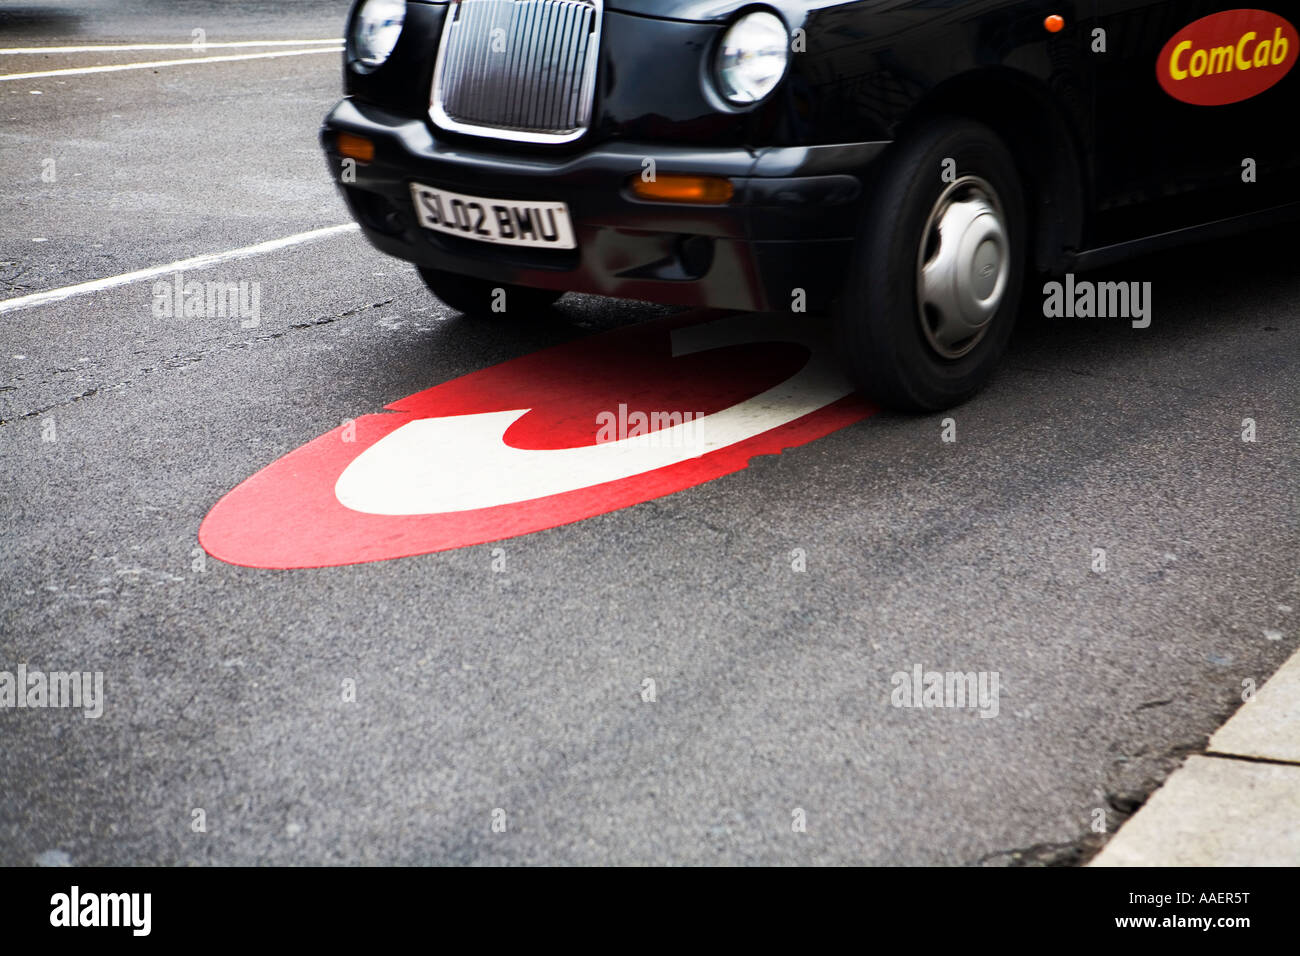 Congestion charge sign at Knightsbridge London - Stock Image